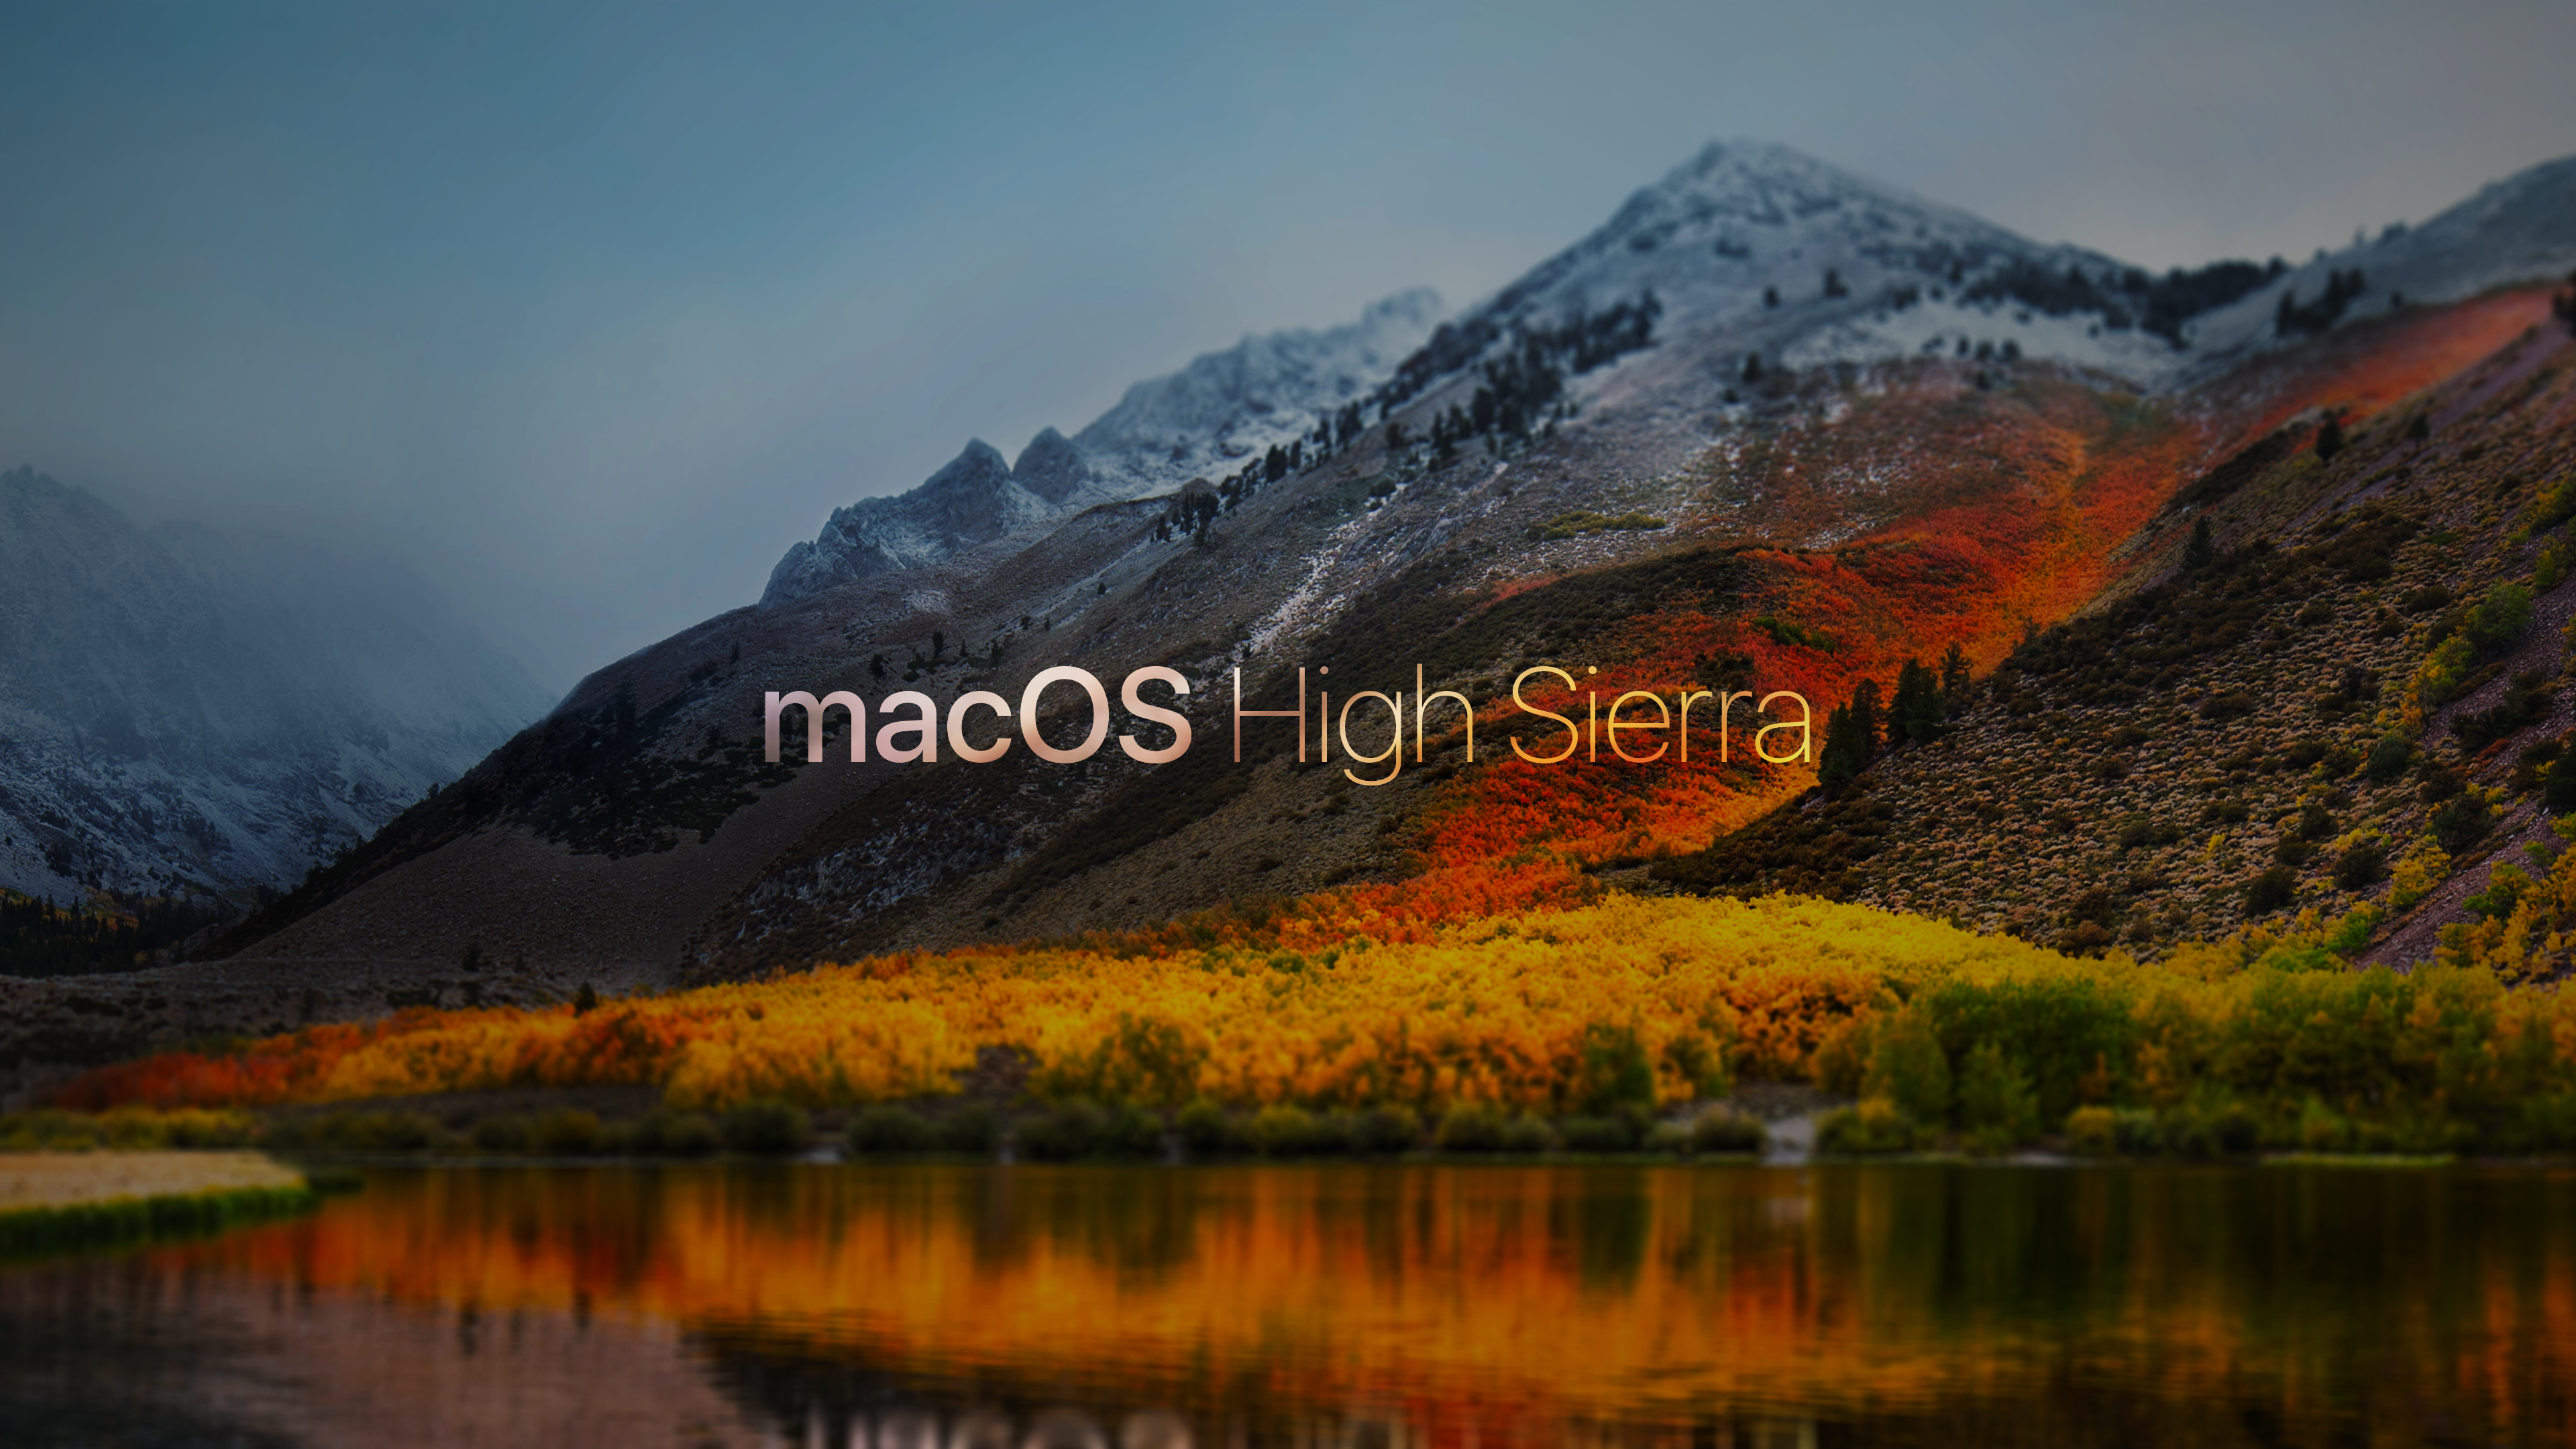 Macos High Sierra Alternative Wallpaper By Kakoten On Deviantart